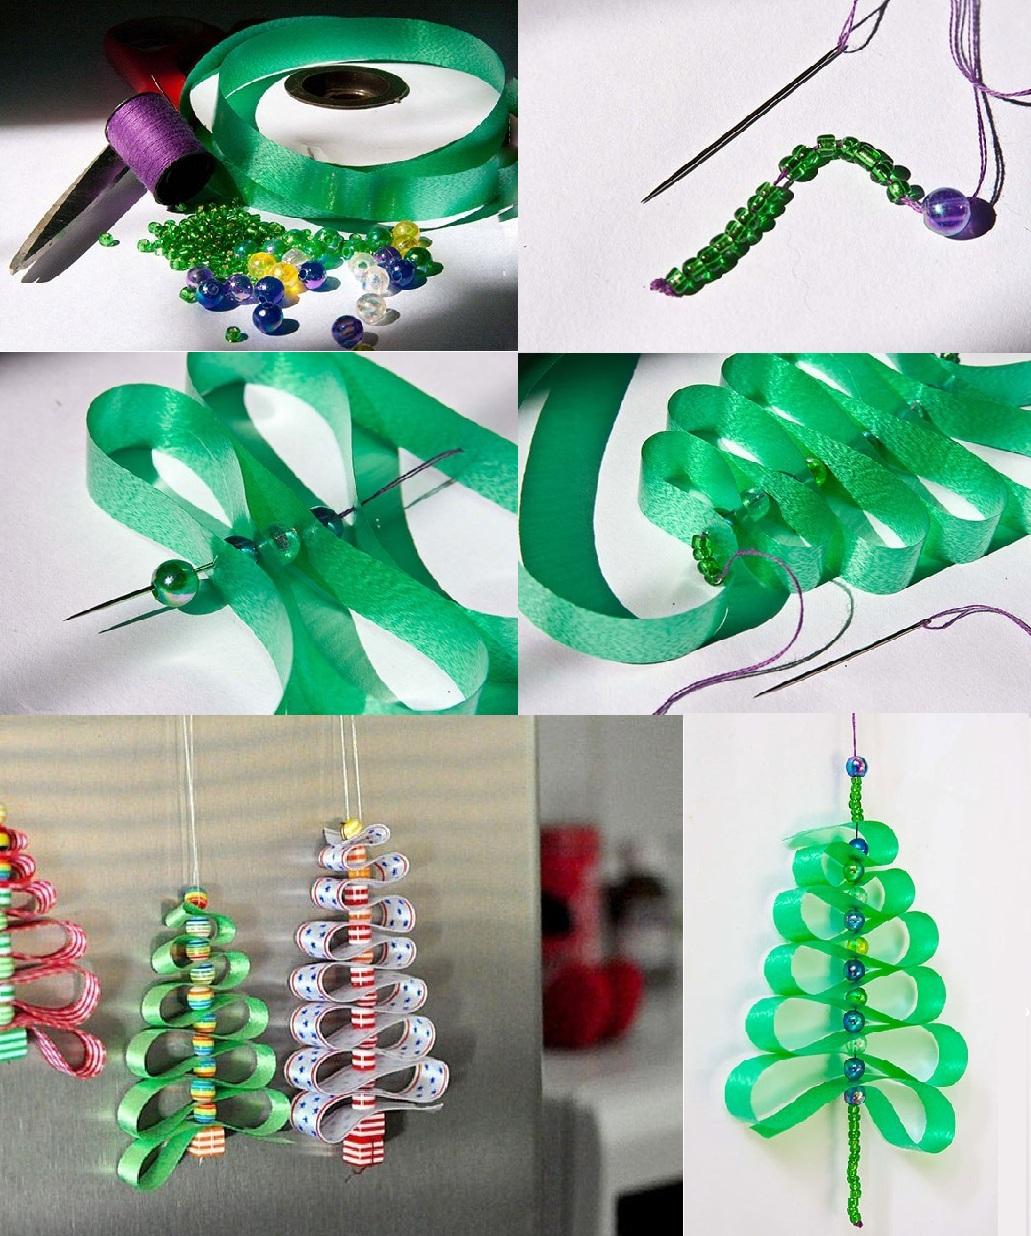 Para estas fiestas arbolitos navide os para colgar como - Cintas navidad para arbol ...